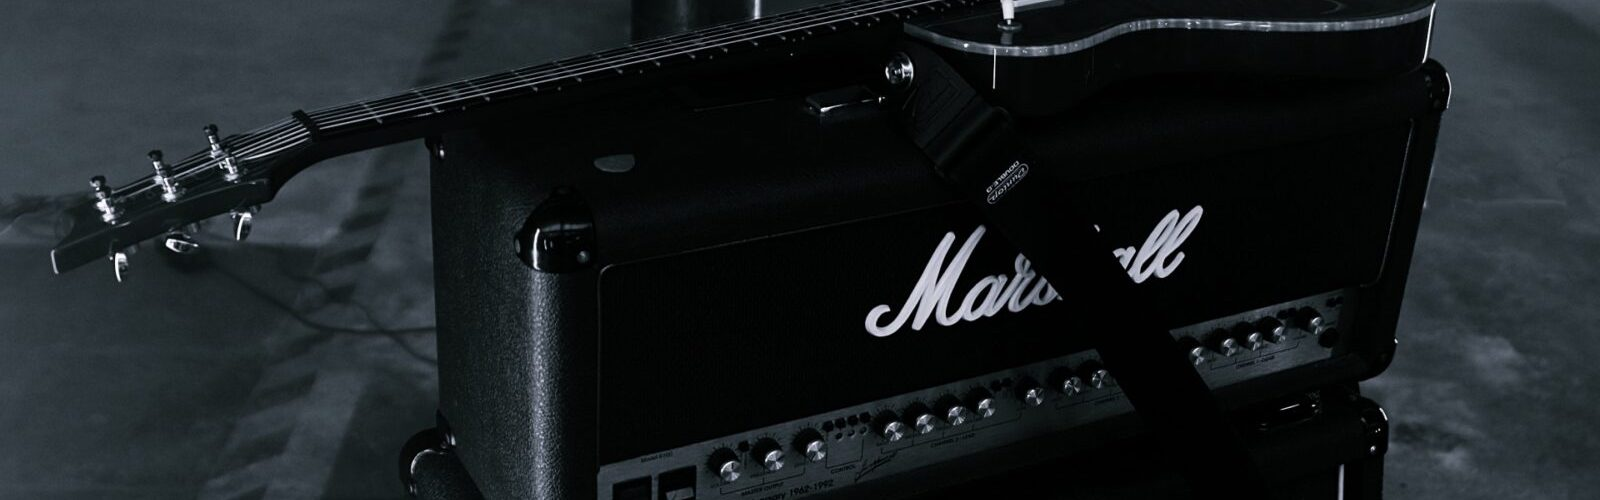 guitar on amp